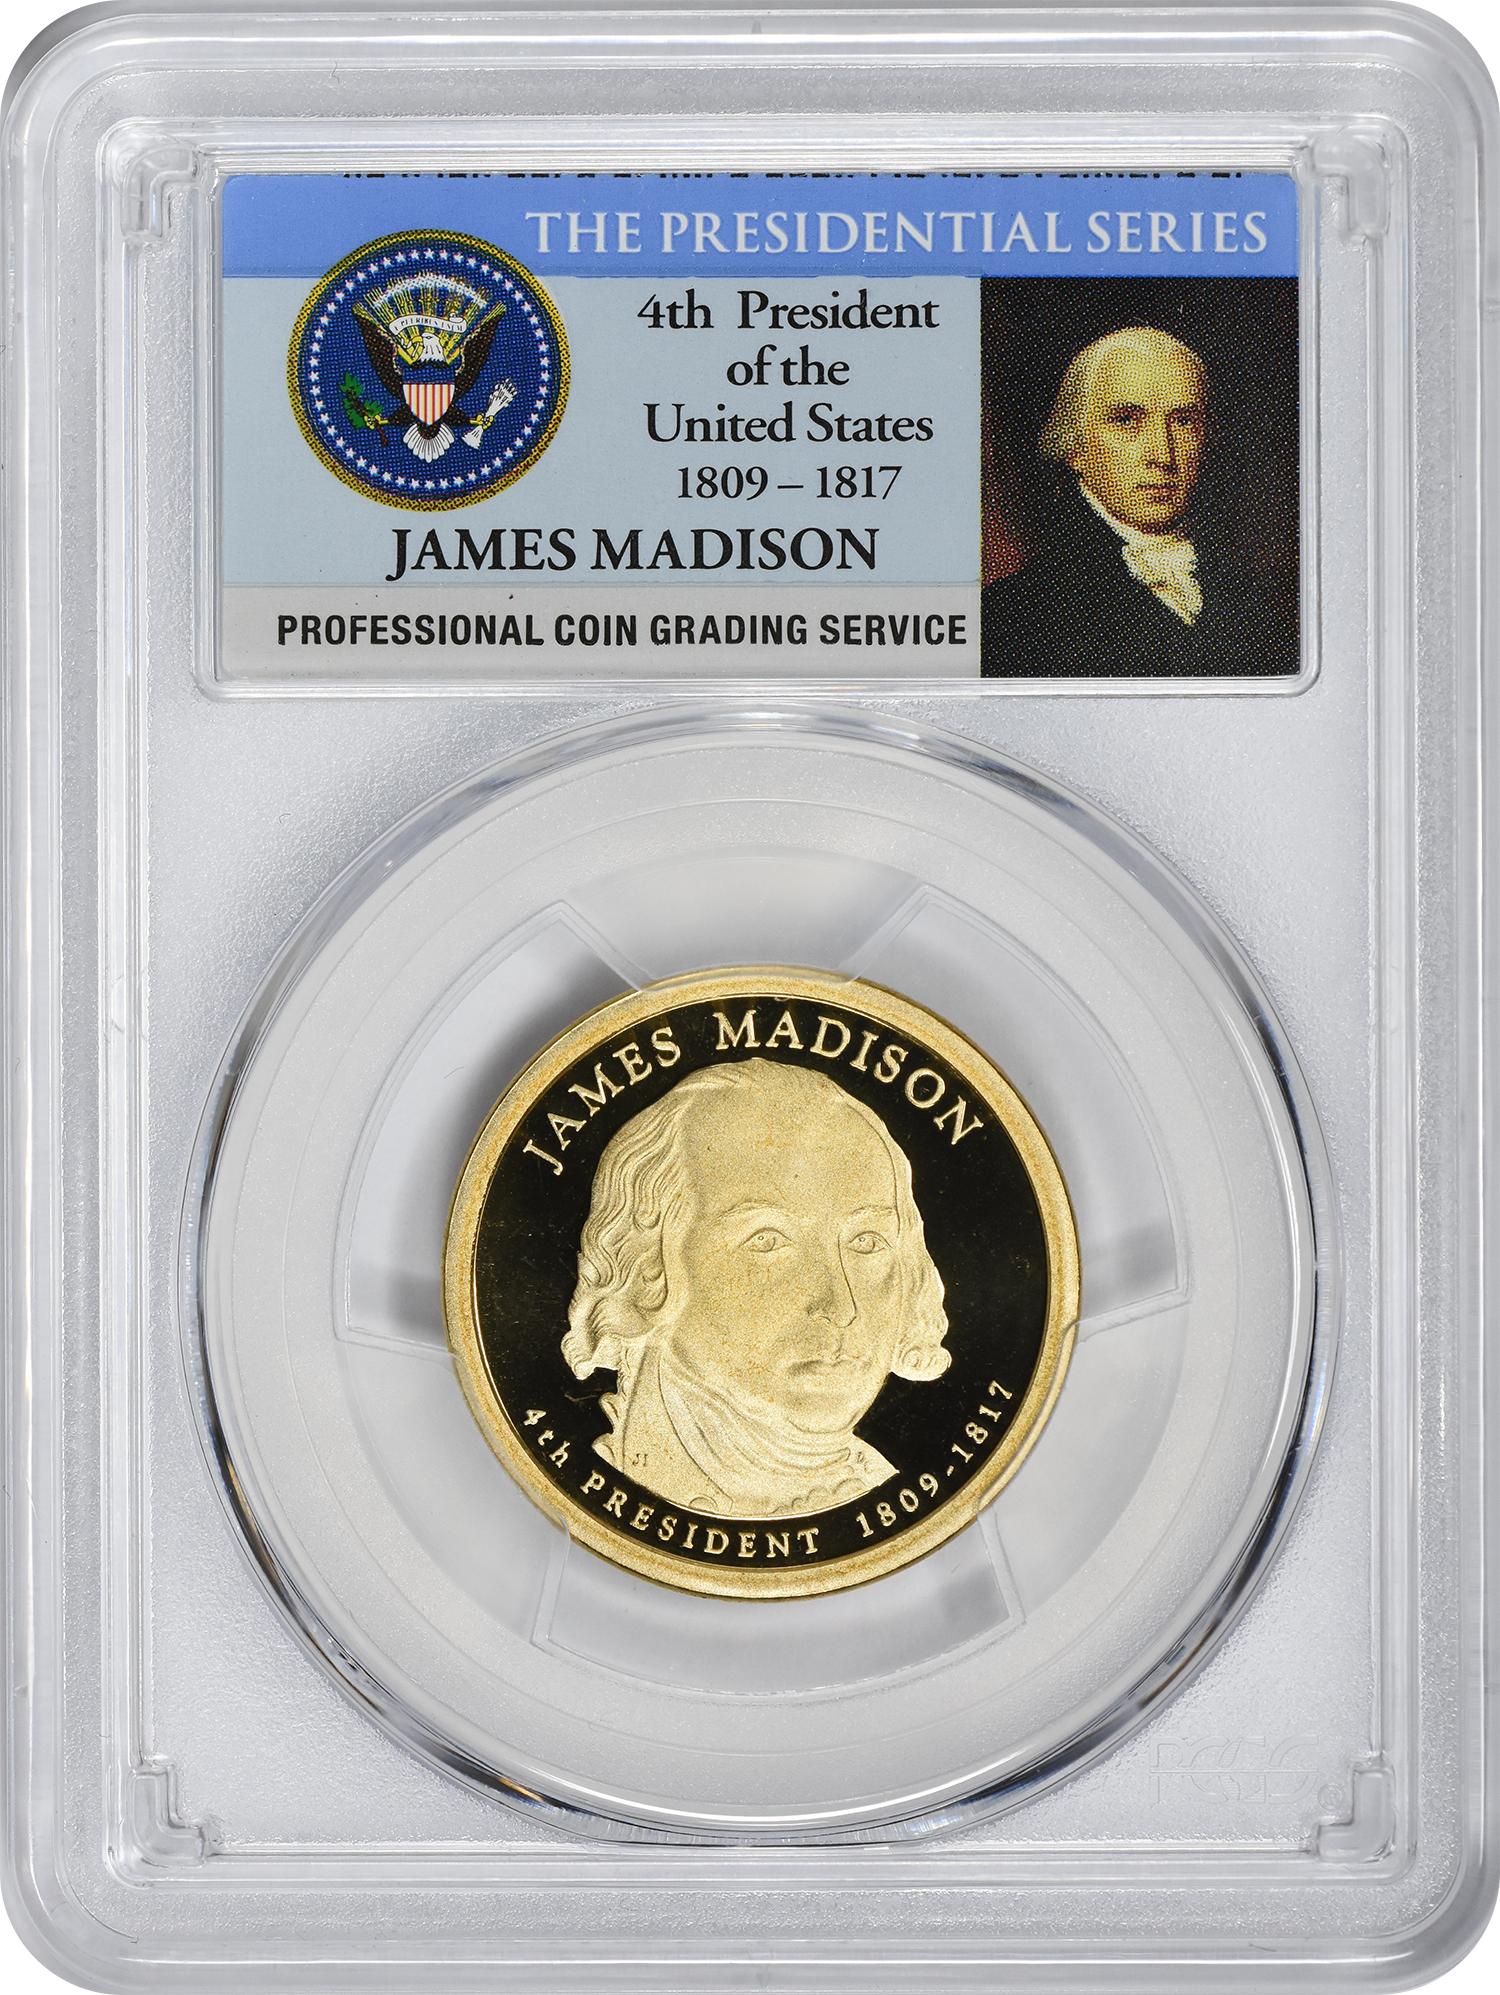 2007-S James Madison Presidential Dollar, PR70DCAM, PCGS